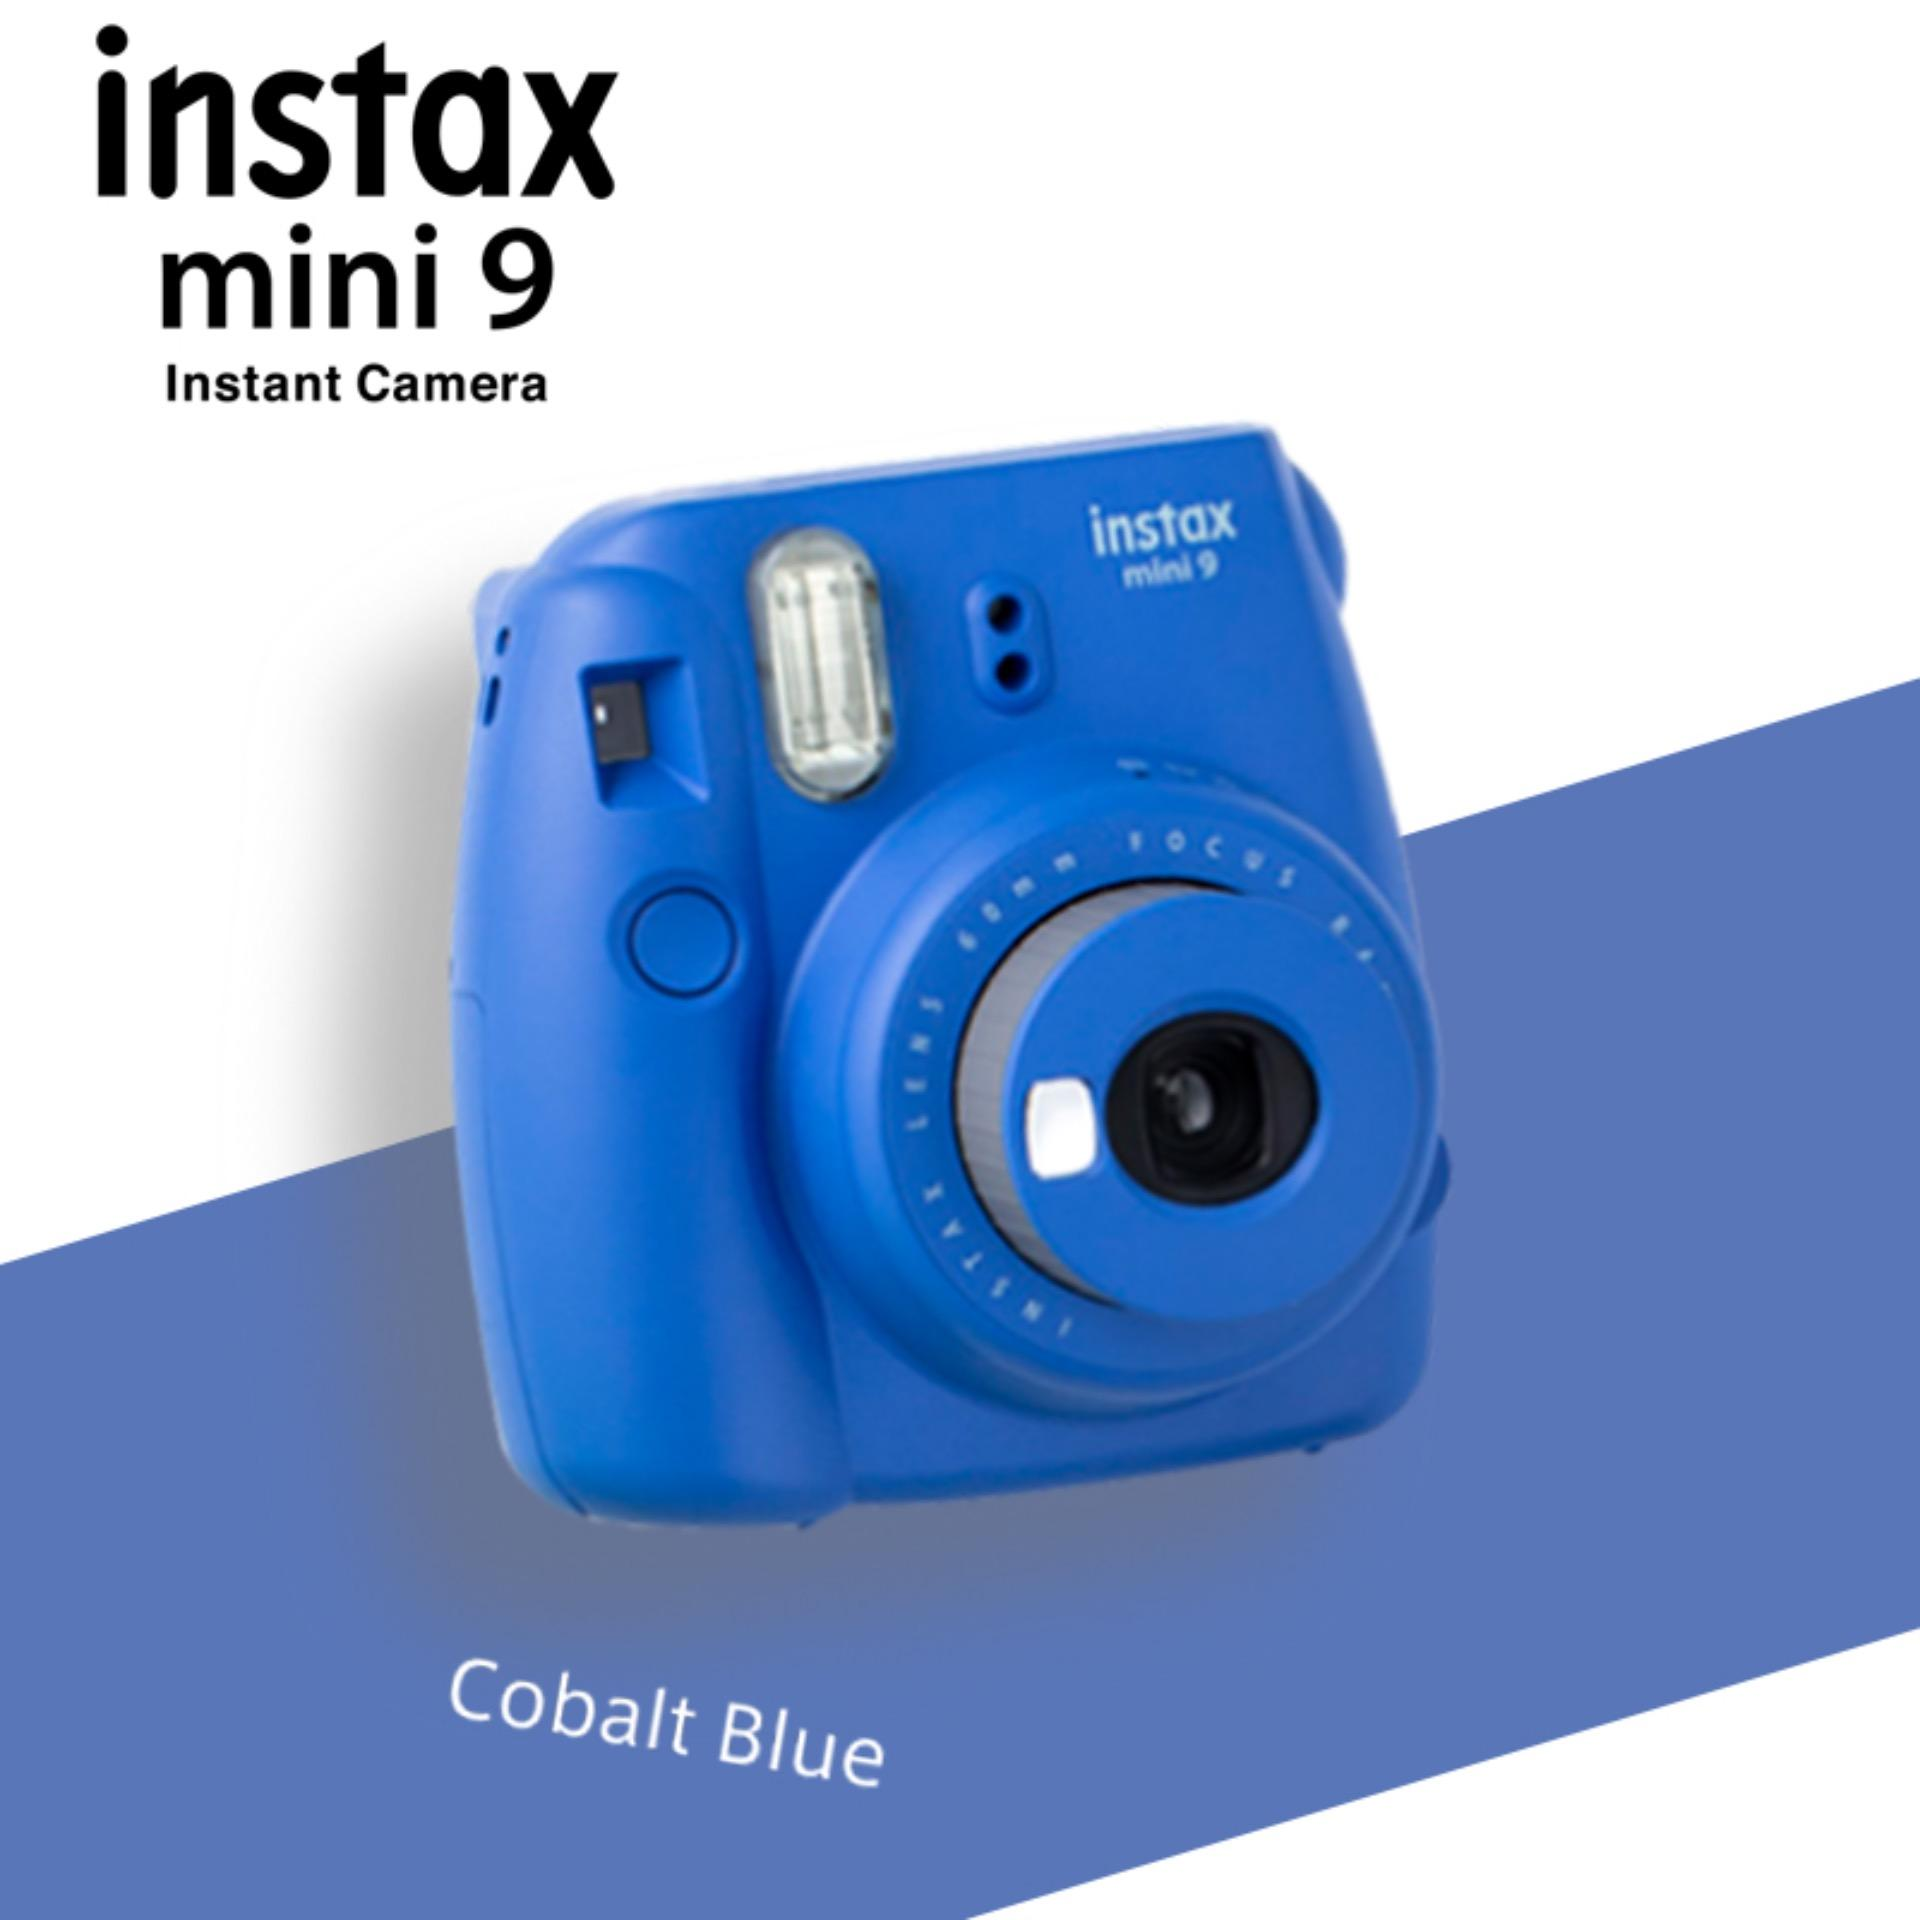 Fujifilm Instax Mini 9 Instant Camera – Cobalt Blue